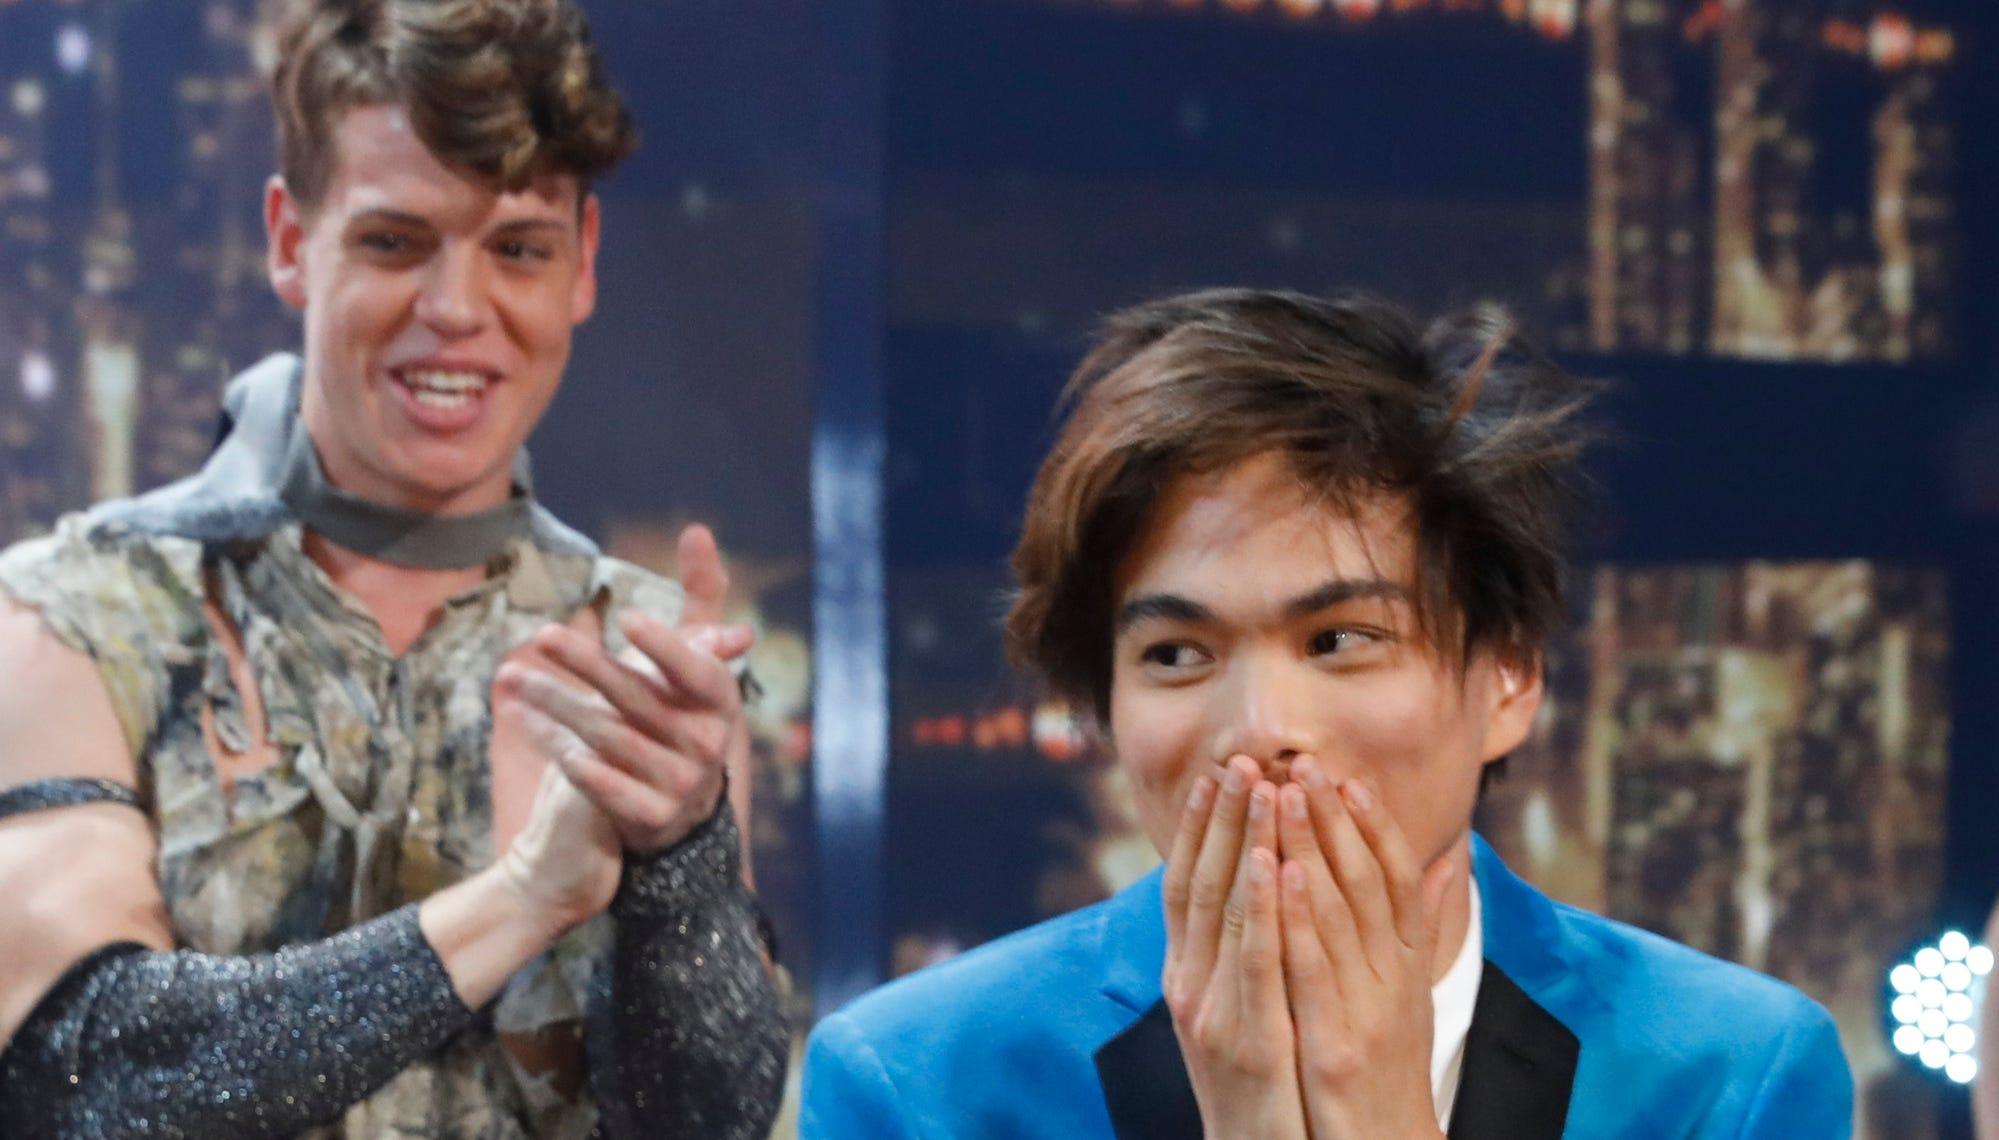 Magician Shin Lim, right, absorbs being named the winner of 'America's Got Talent' as a member of runner-up Zurcaroh, a dance group, applauds behind him.